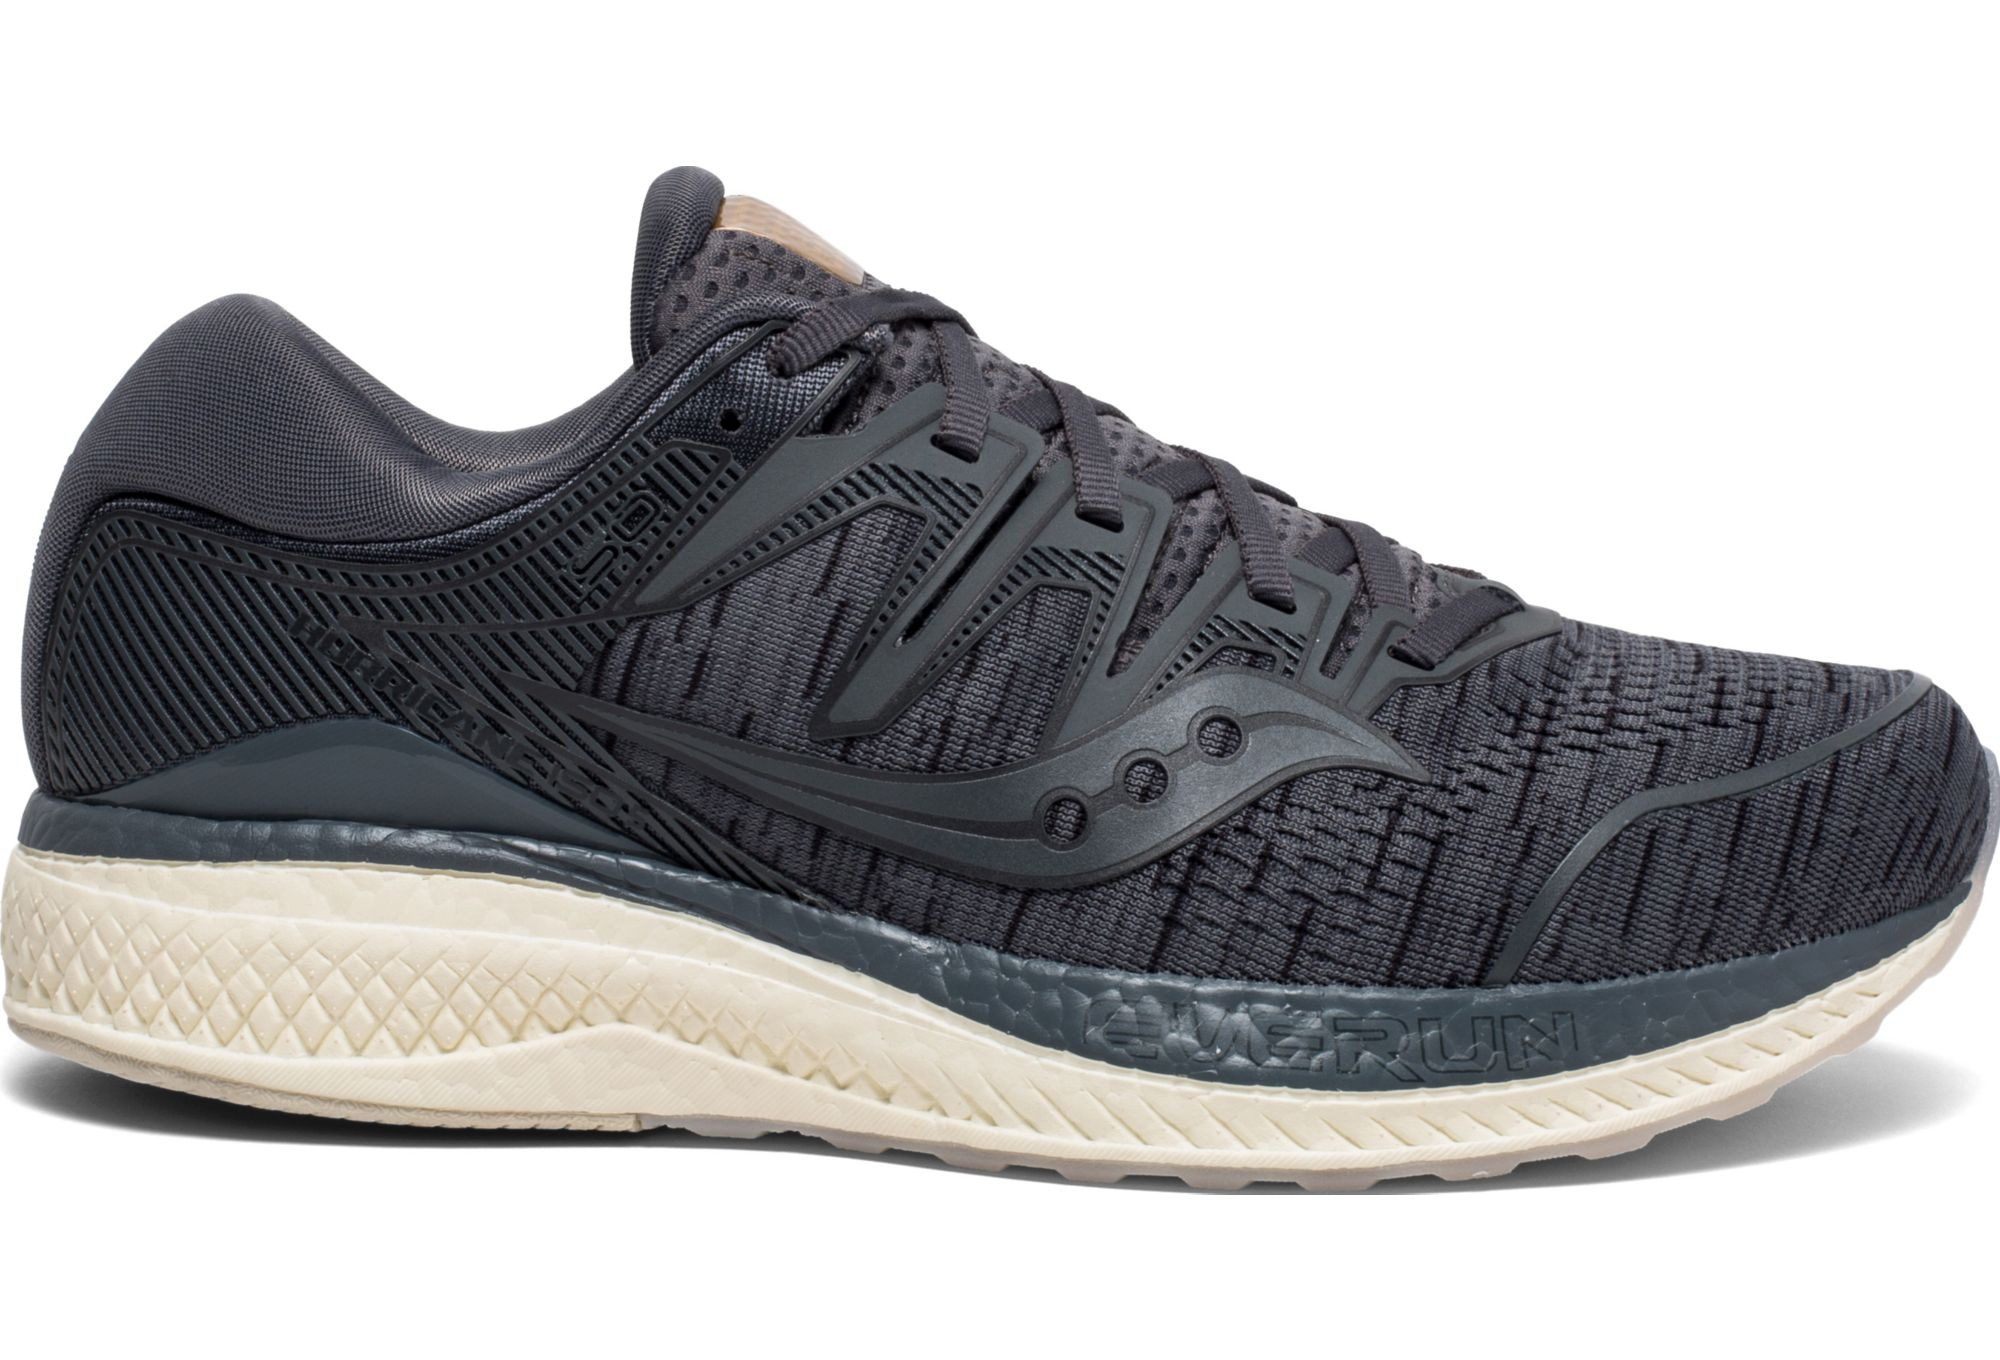 81dfaa8d Saucony Hurricane ISO 5 Running Shoes Grey Shade | Alltricks.com